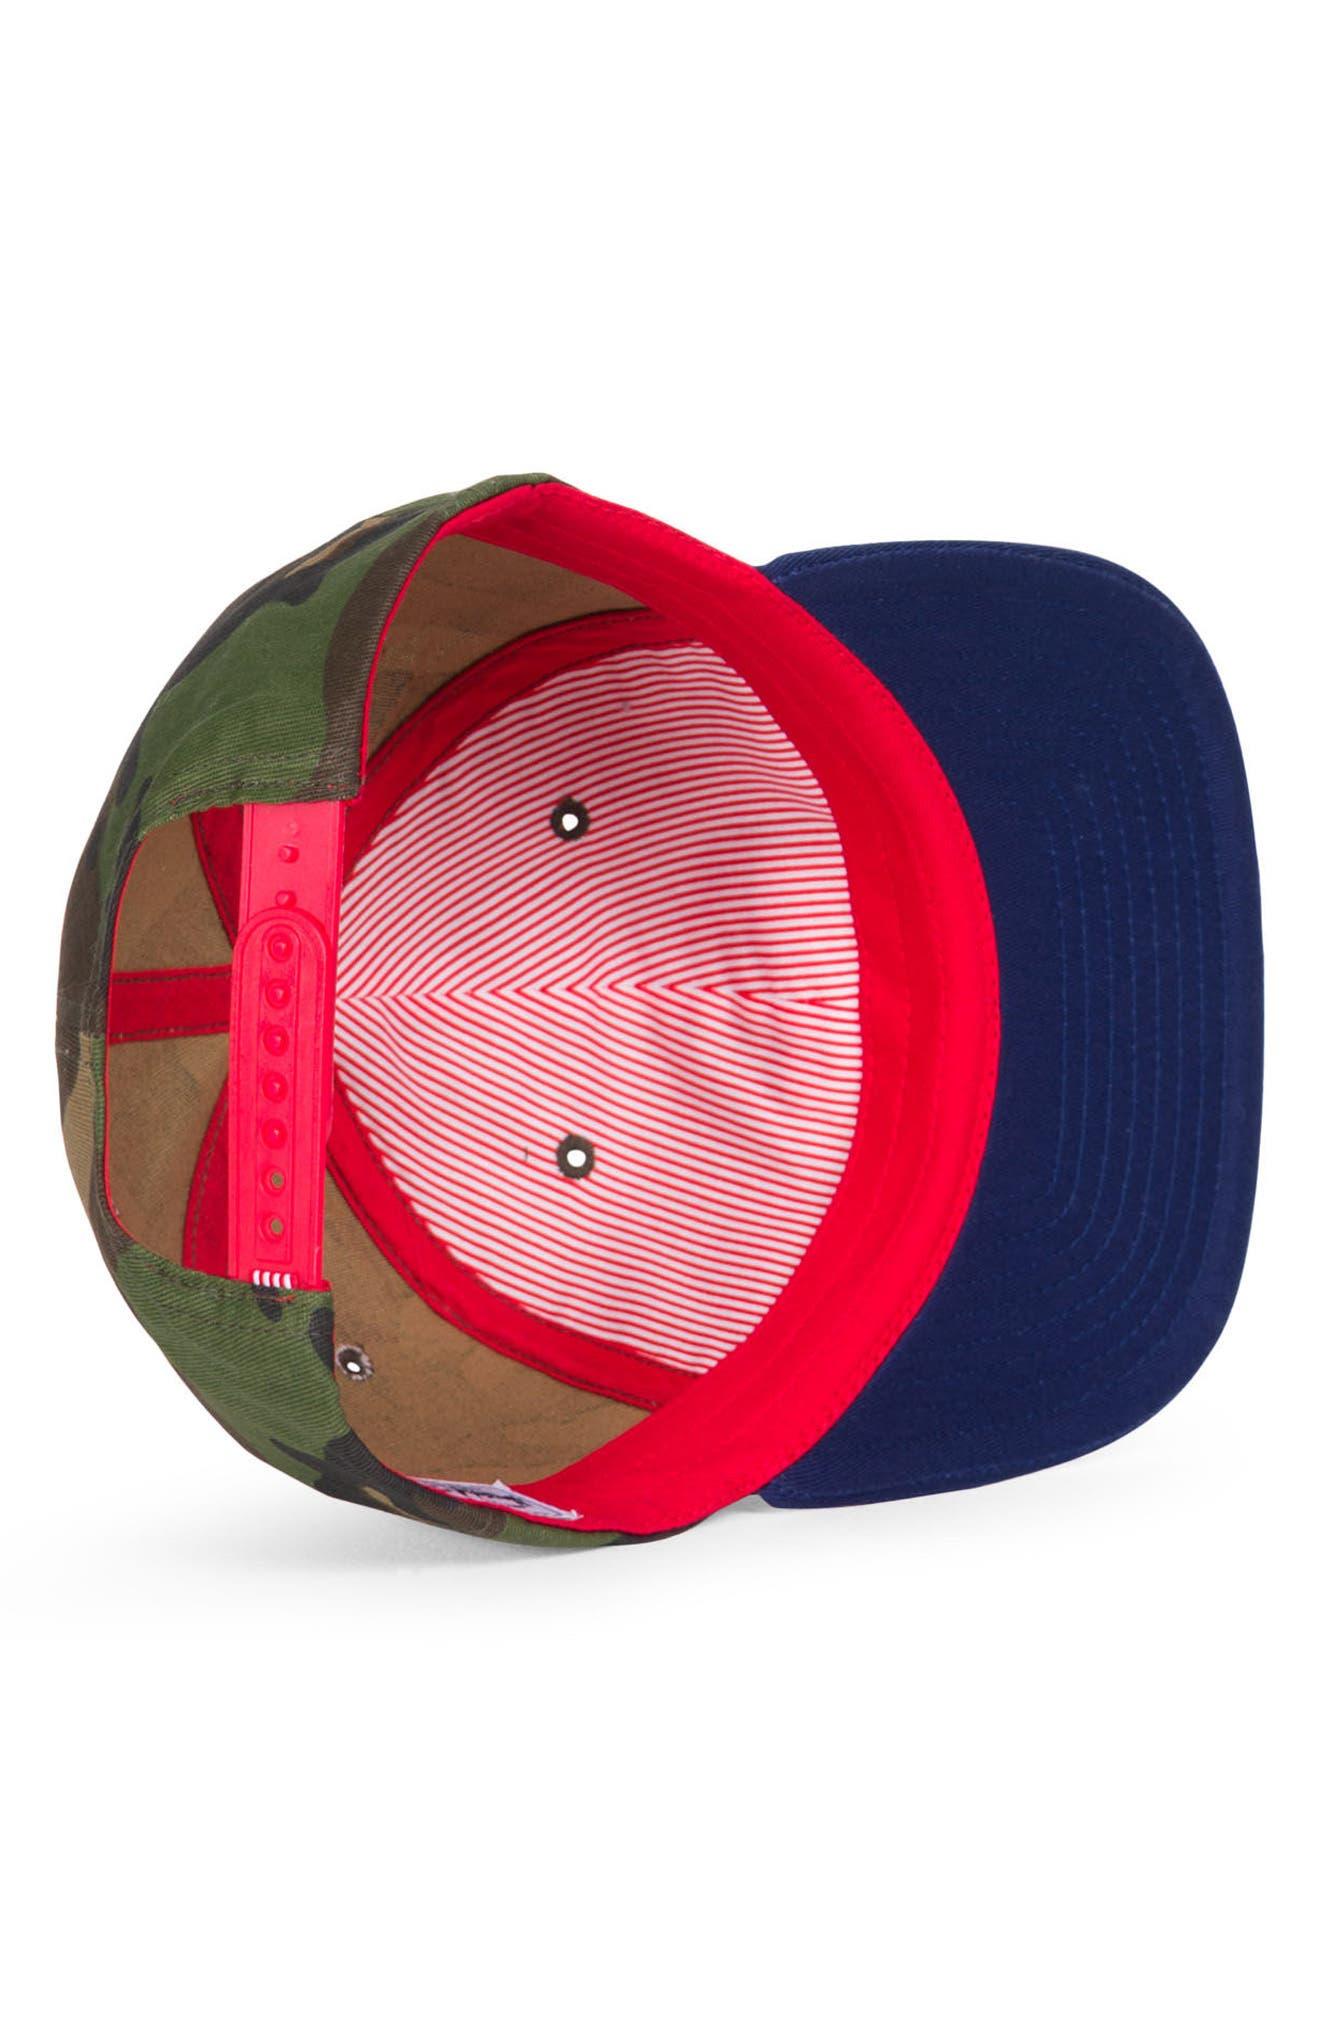 Mosby Camo Snapback Baseball Cap,                             Alternate thumbnail 3, color,                             Woodland Camo/ Navy/ Red